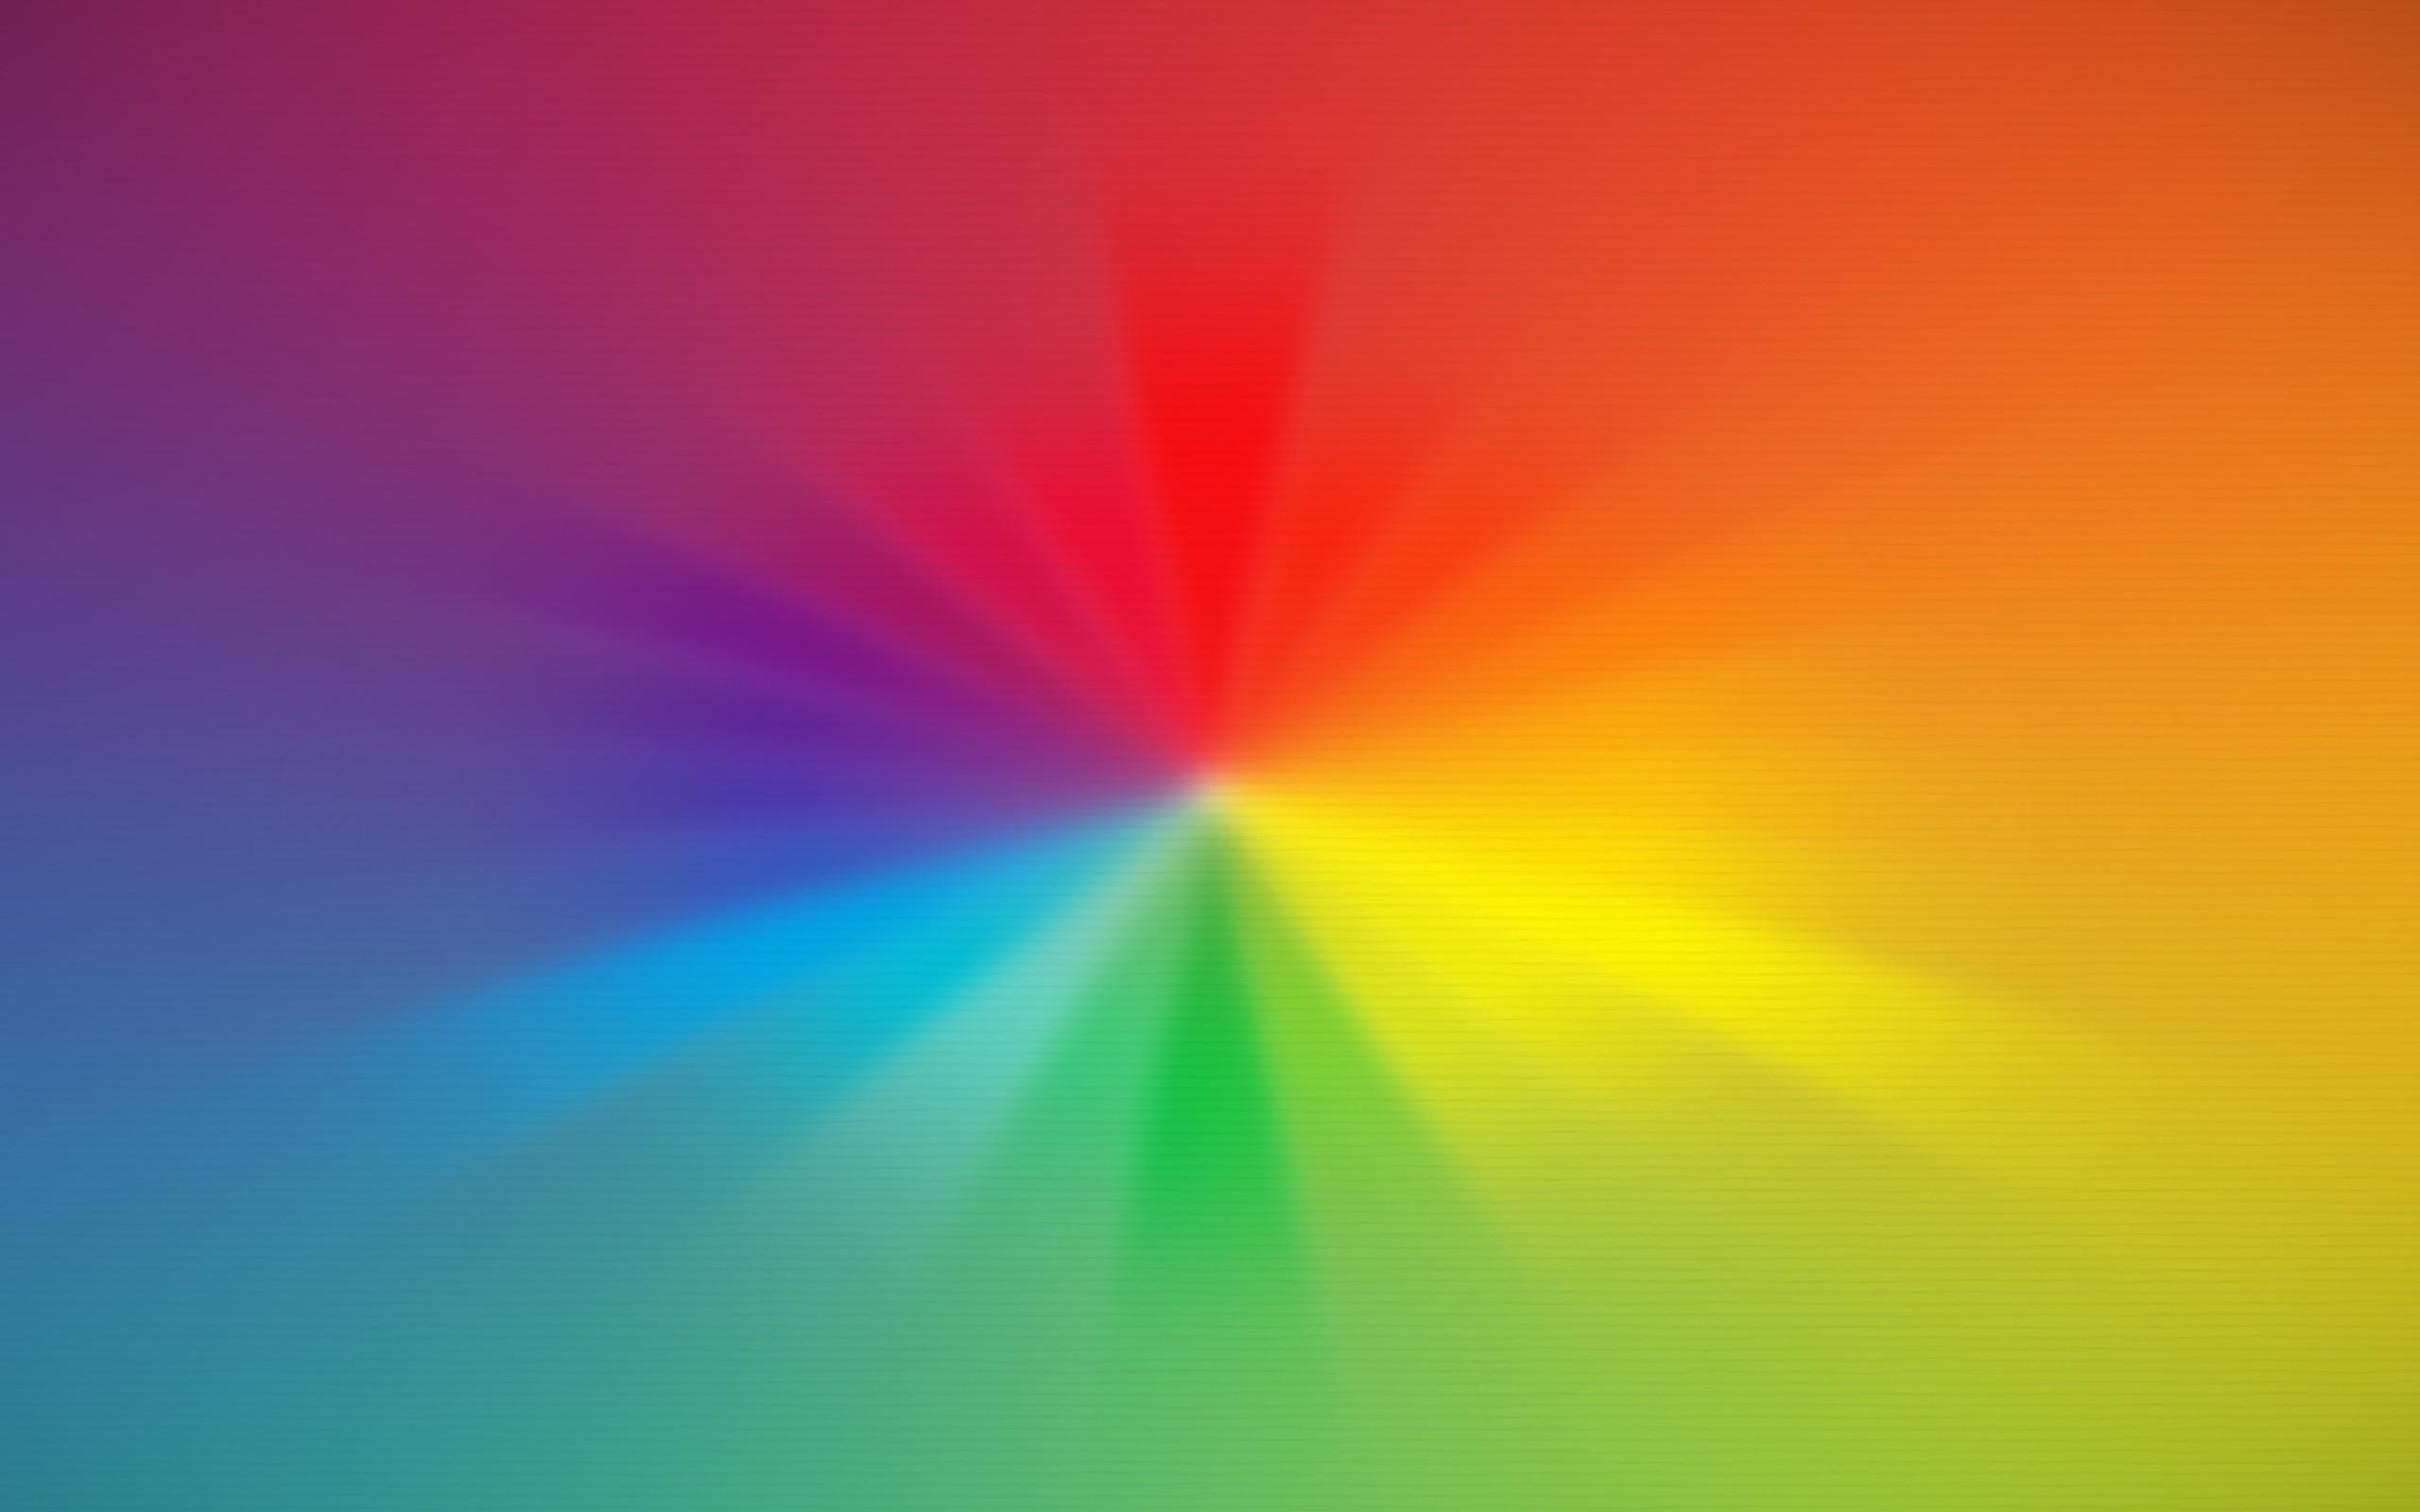 Res: 2560x1600, Spektra, Rainbow, High, Definition, Full, Screen, Hd, Wallpaper, High  Resolution Photos, Artwork, Display, 2560×1600 Wallpaper HD